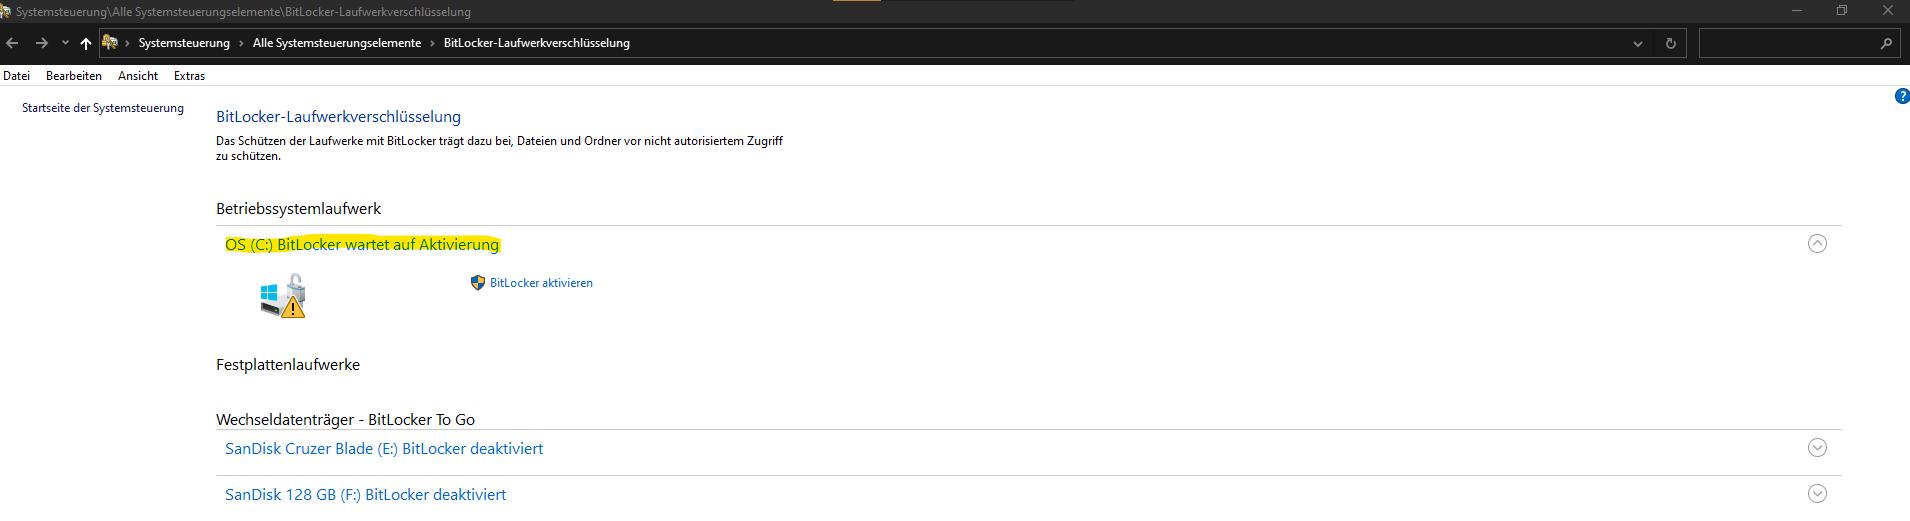 Screenshot 2021-01-26 111951 Bitlocker wartet auf Aktivierung.png